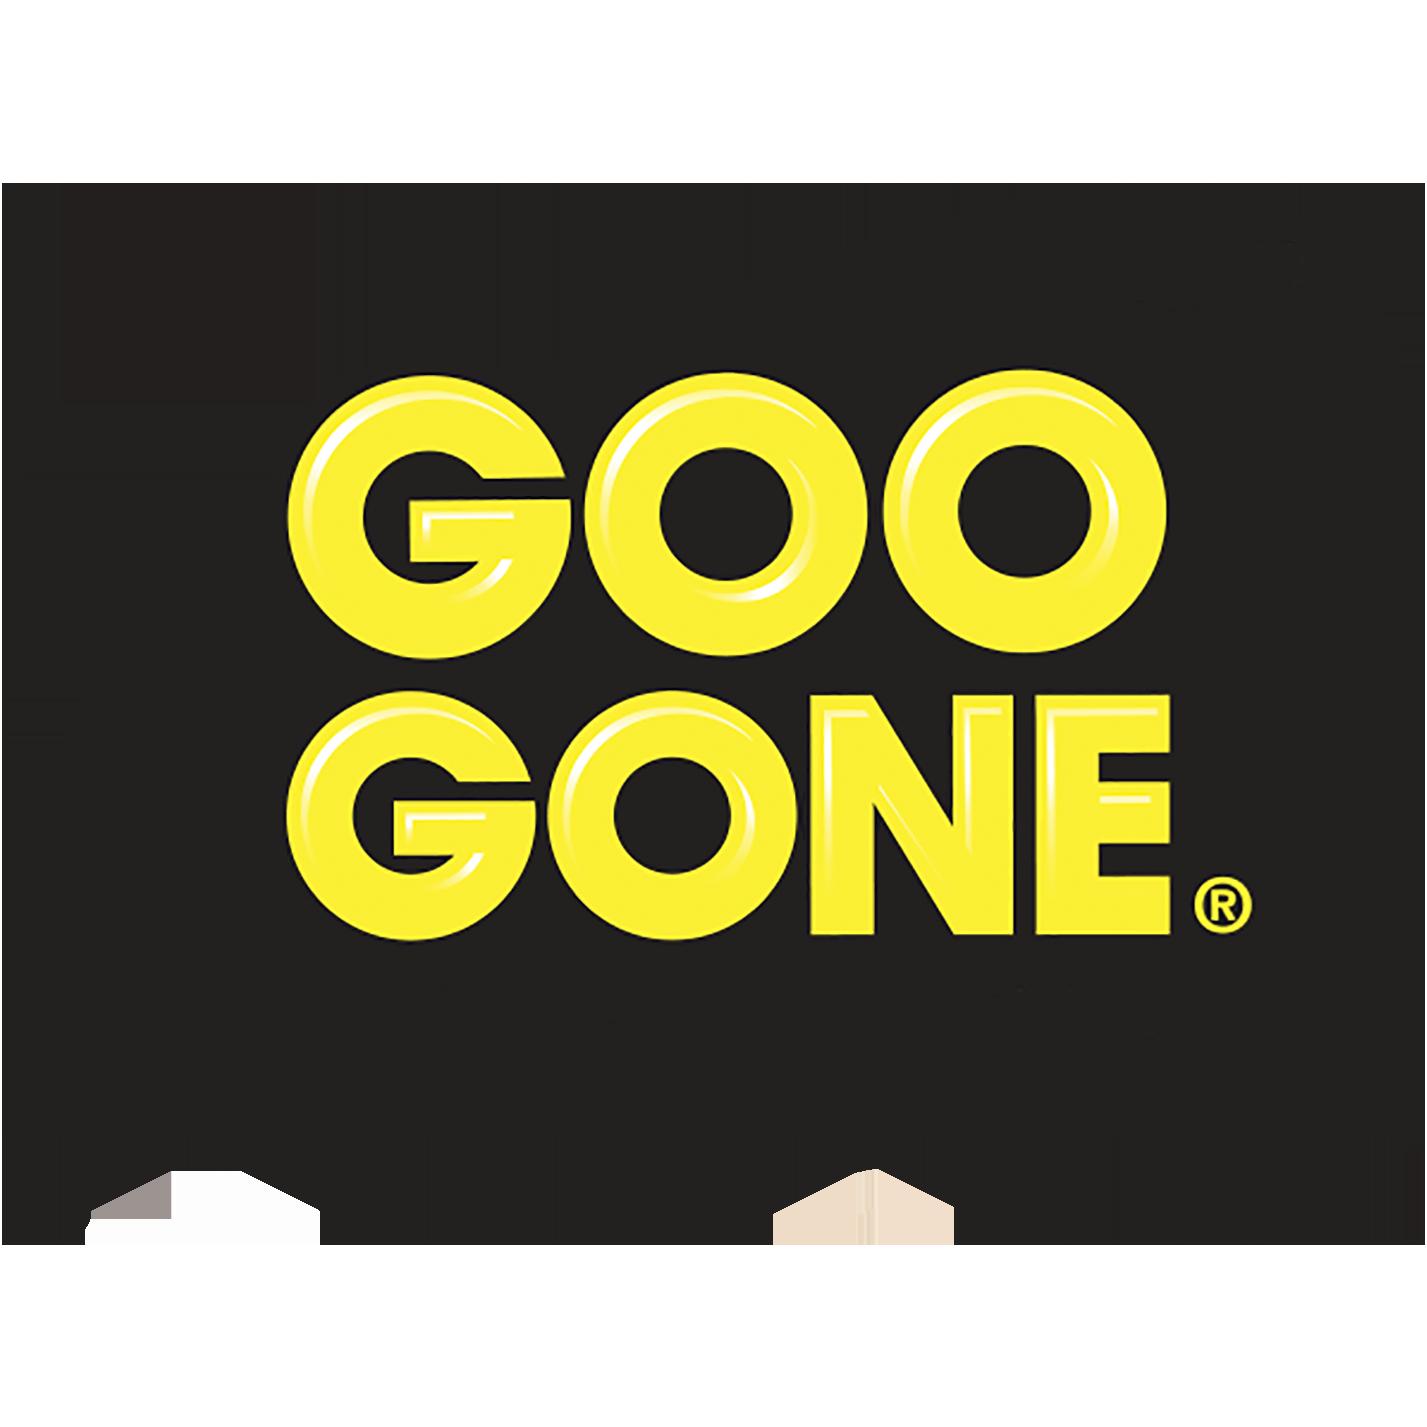 goo gone.png